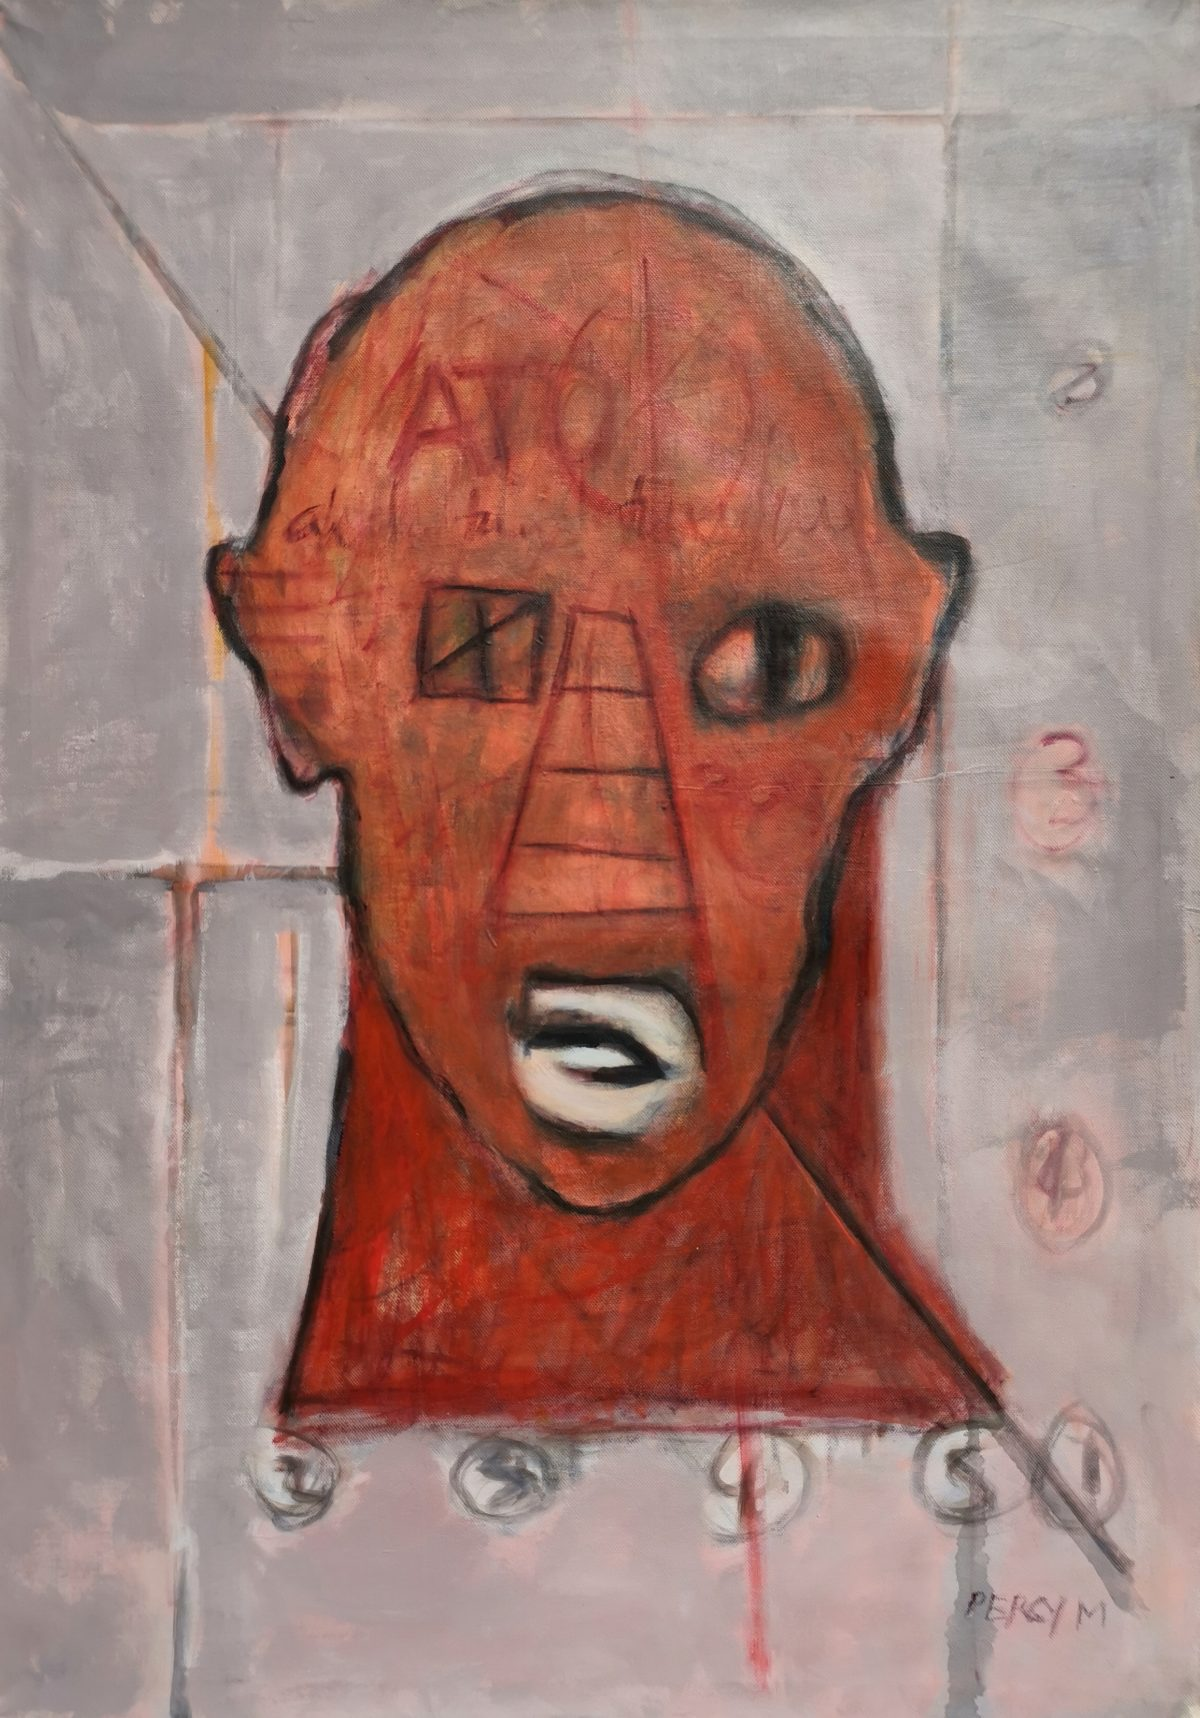 Percy Manyonga - Mind Game - 2014